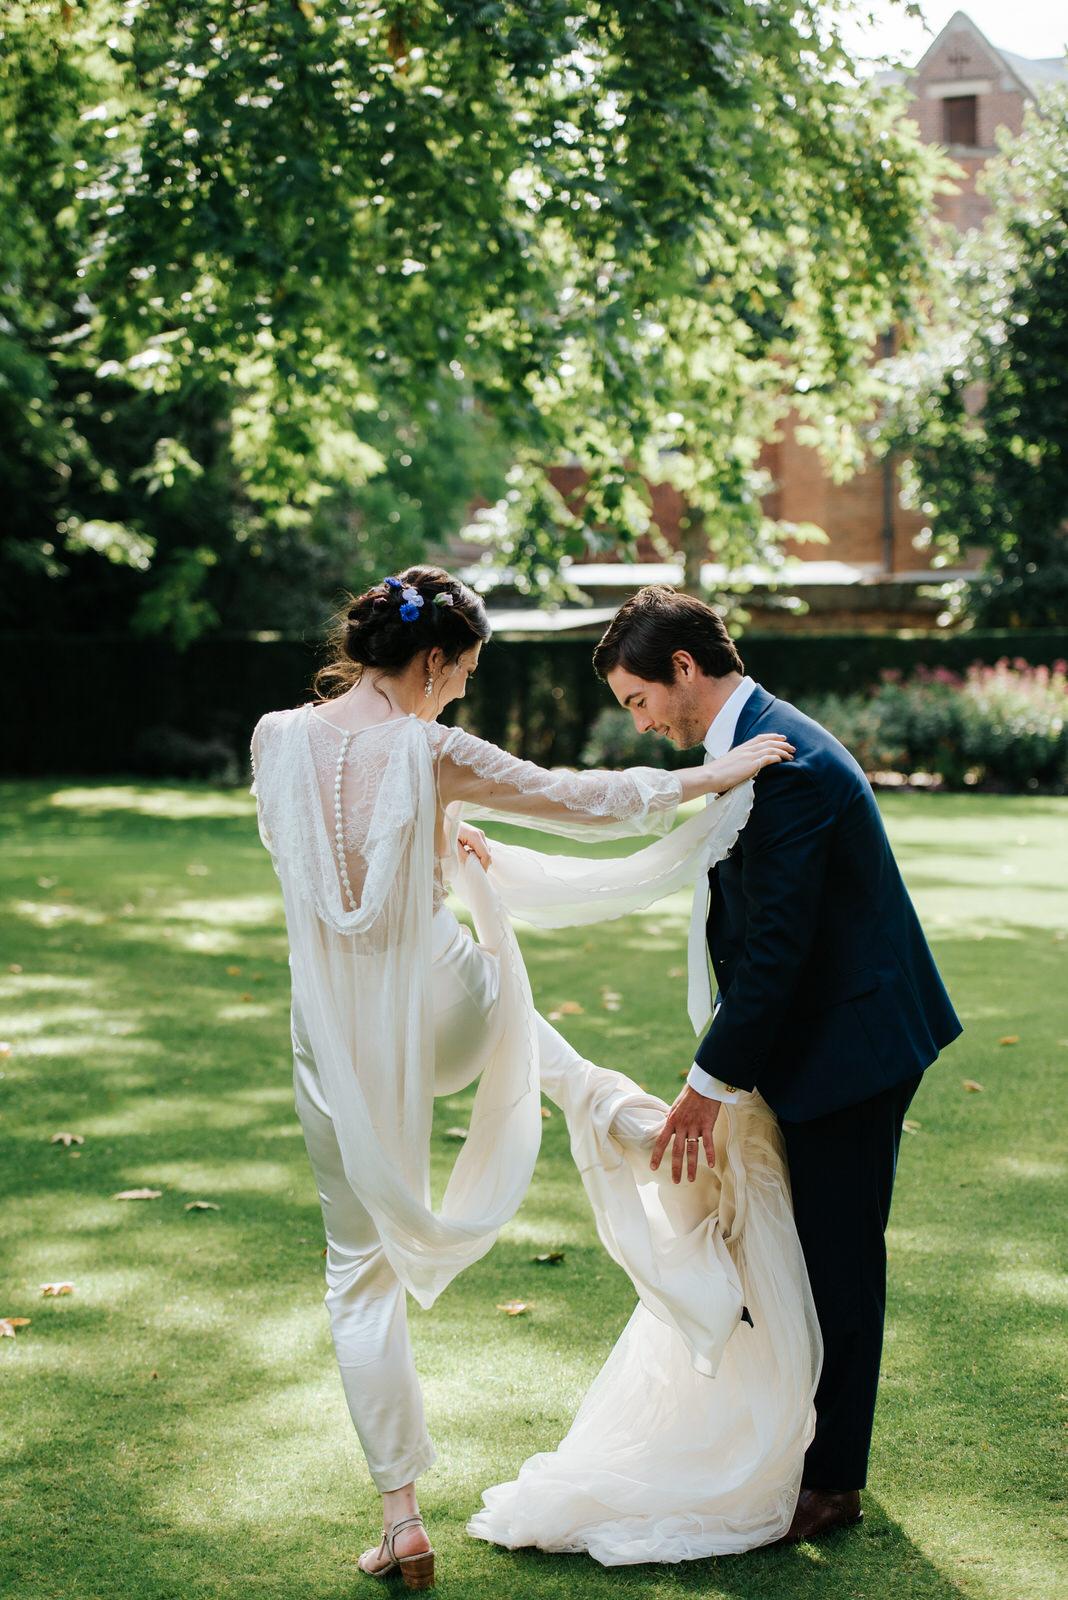 Groom helps bride take off her skirt to reveal wedding dress und